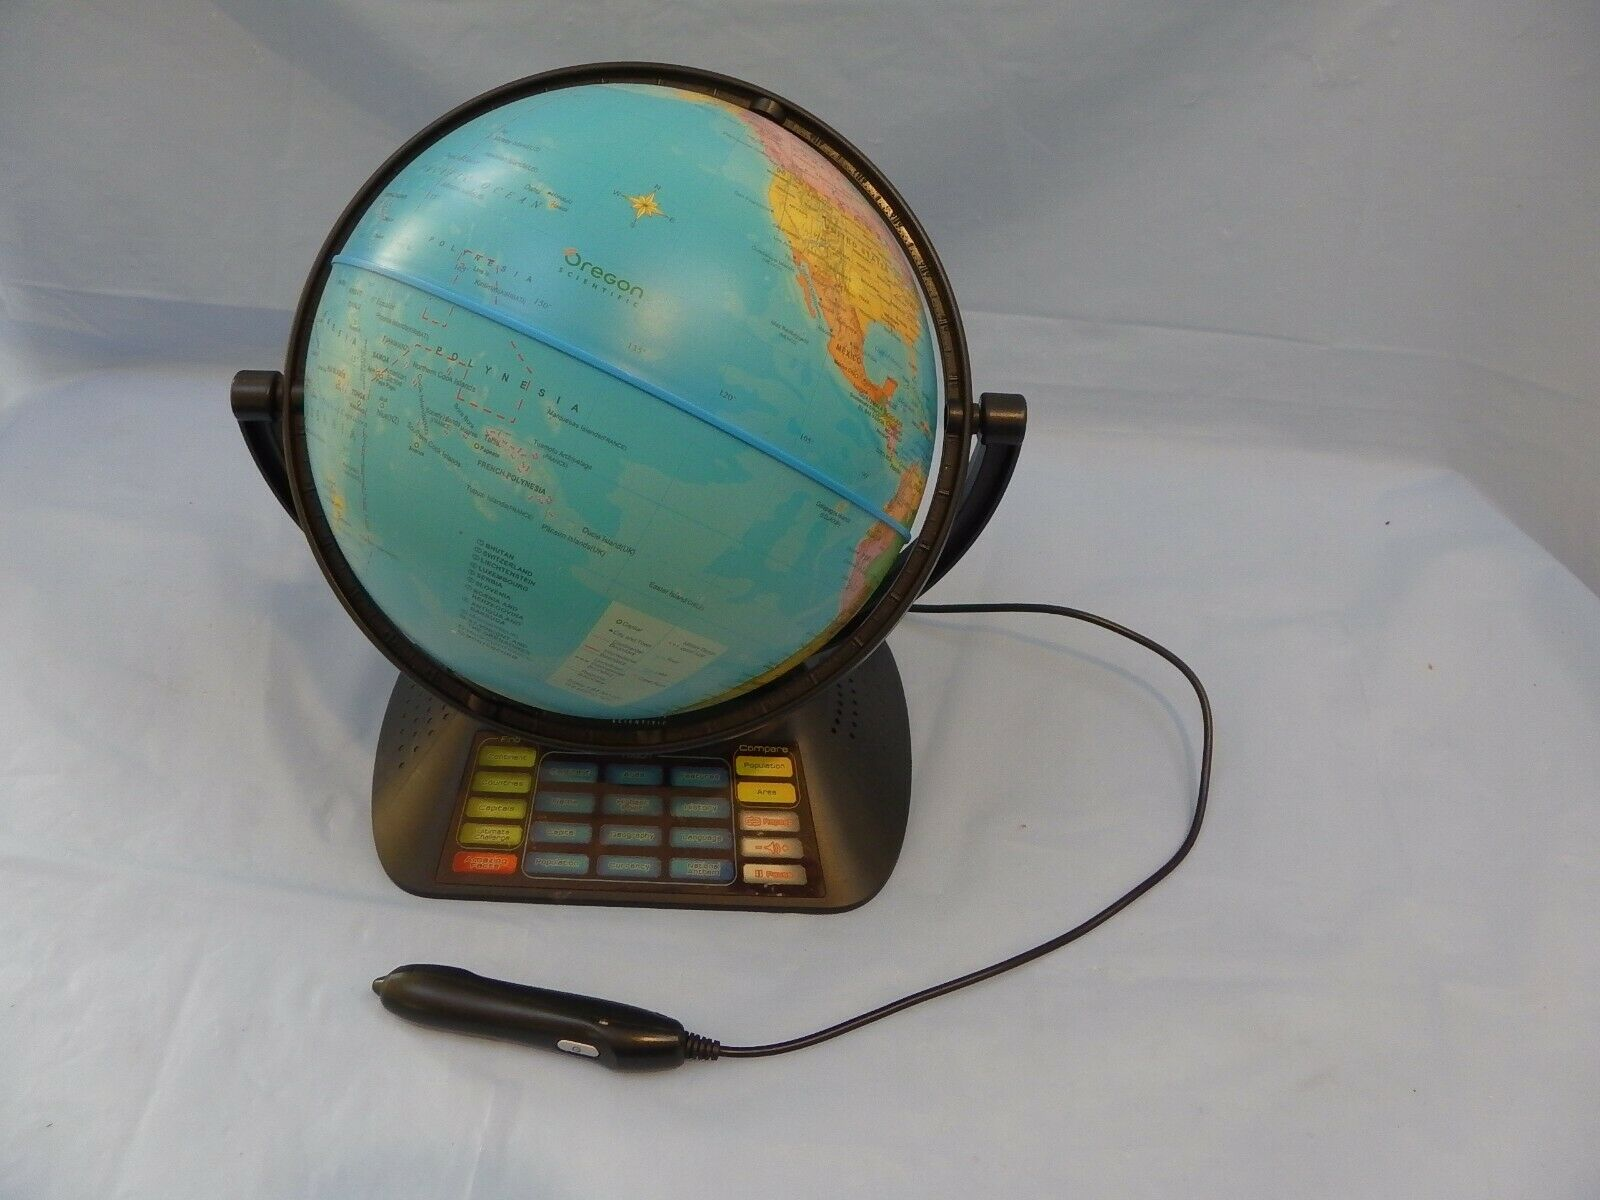 Oregon Scientific Smart Globe with Pen SG01-18 Geography Educational Spielzeug Globus